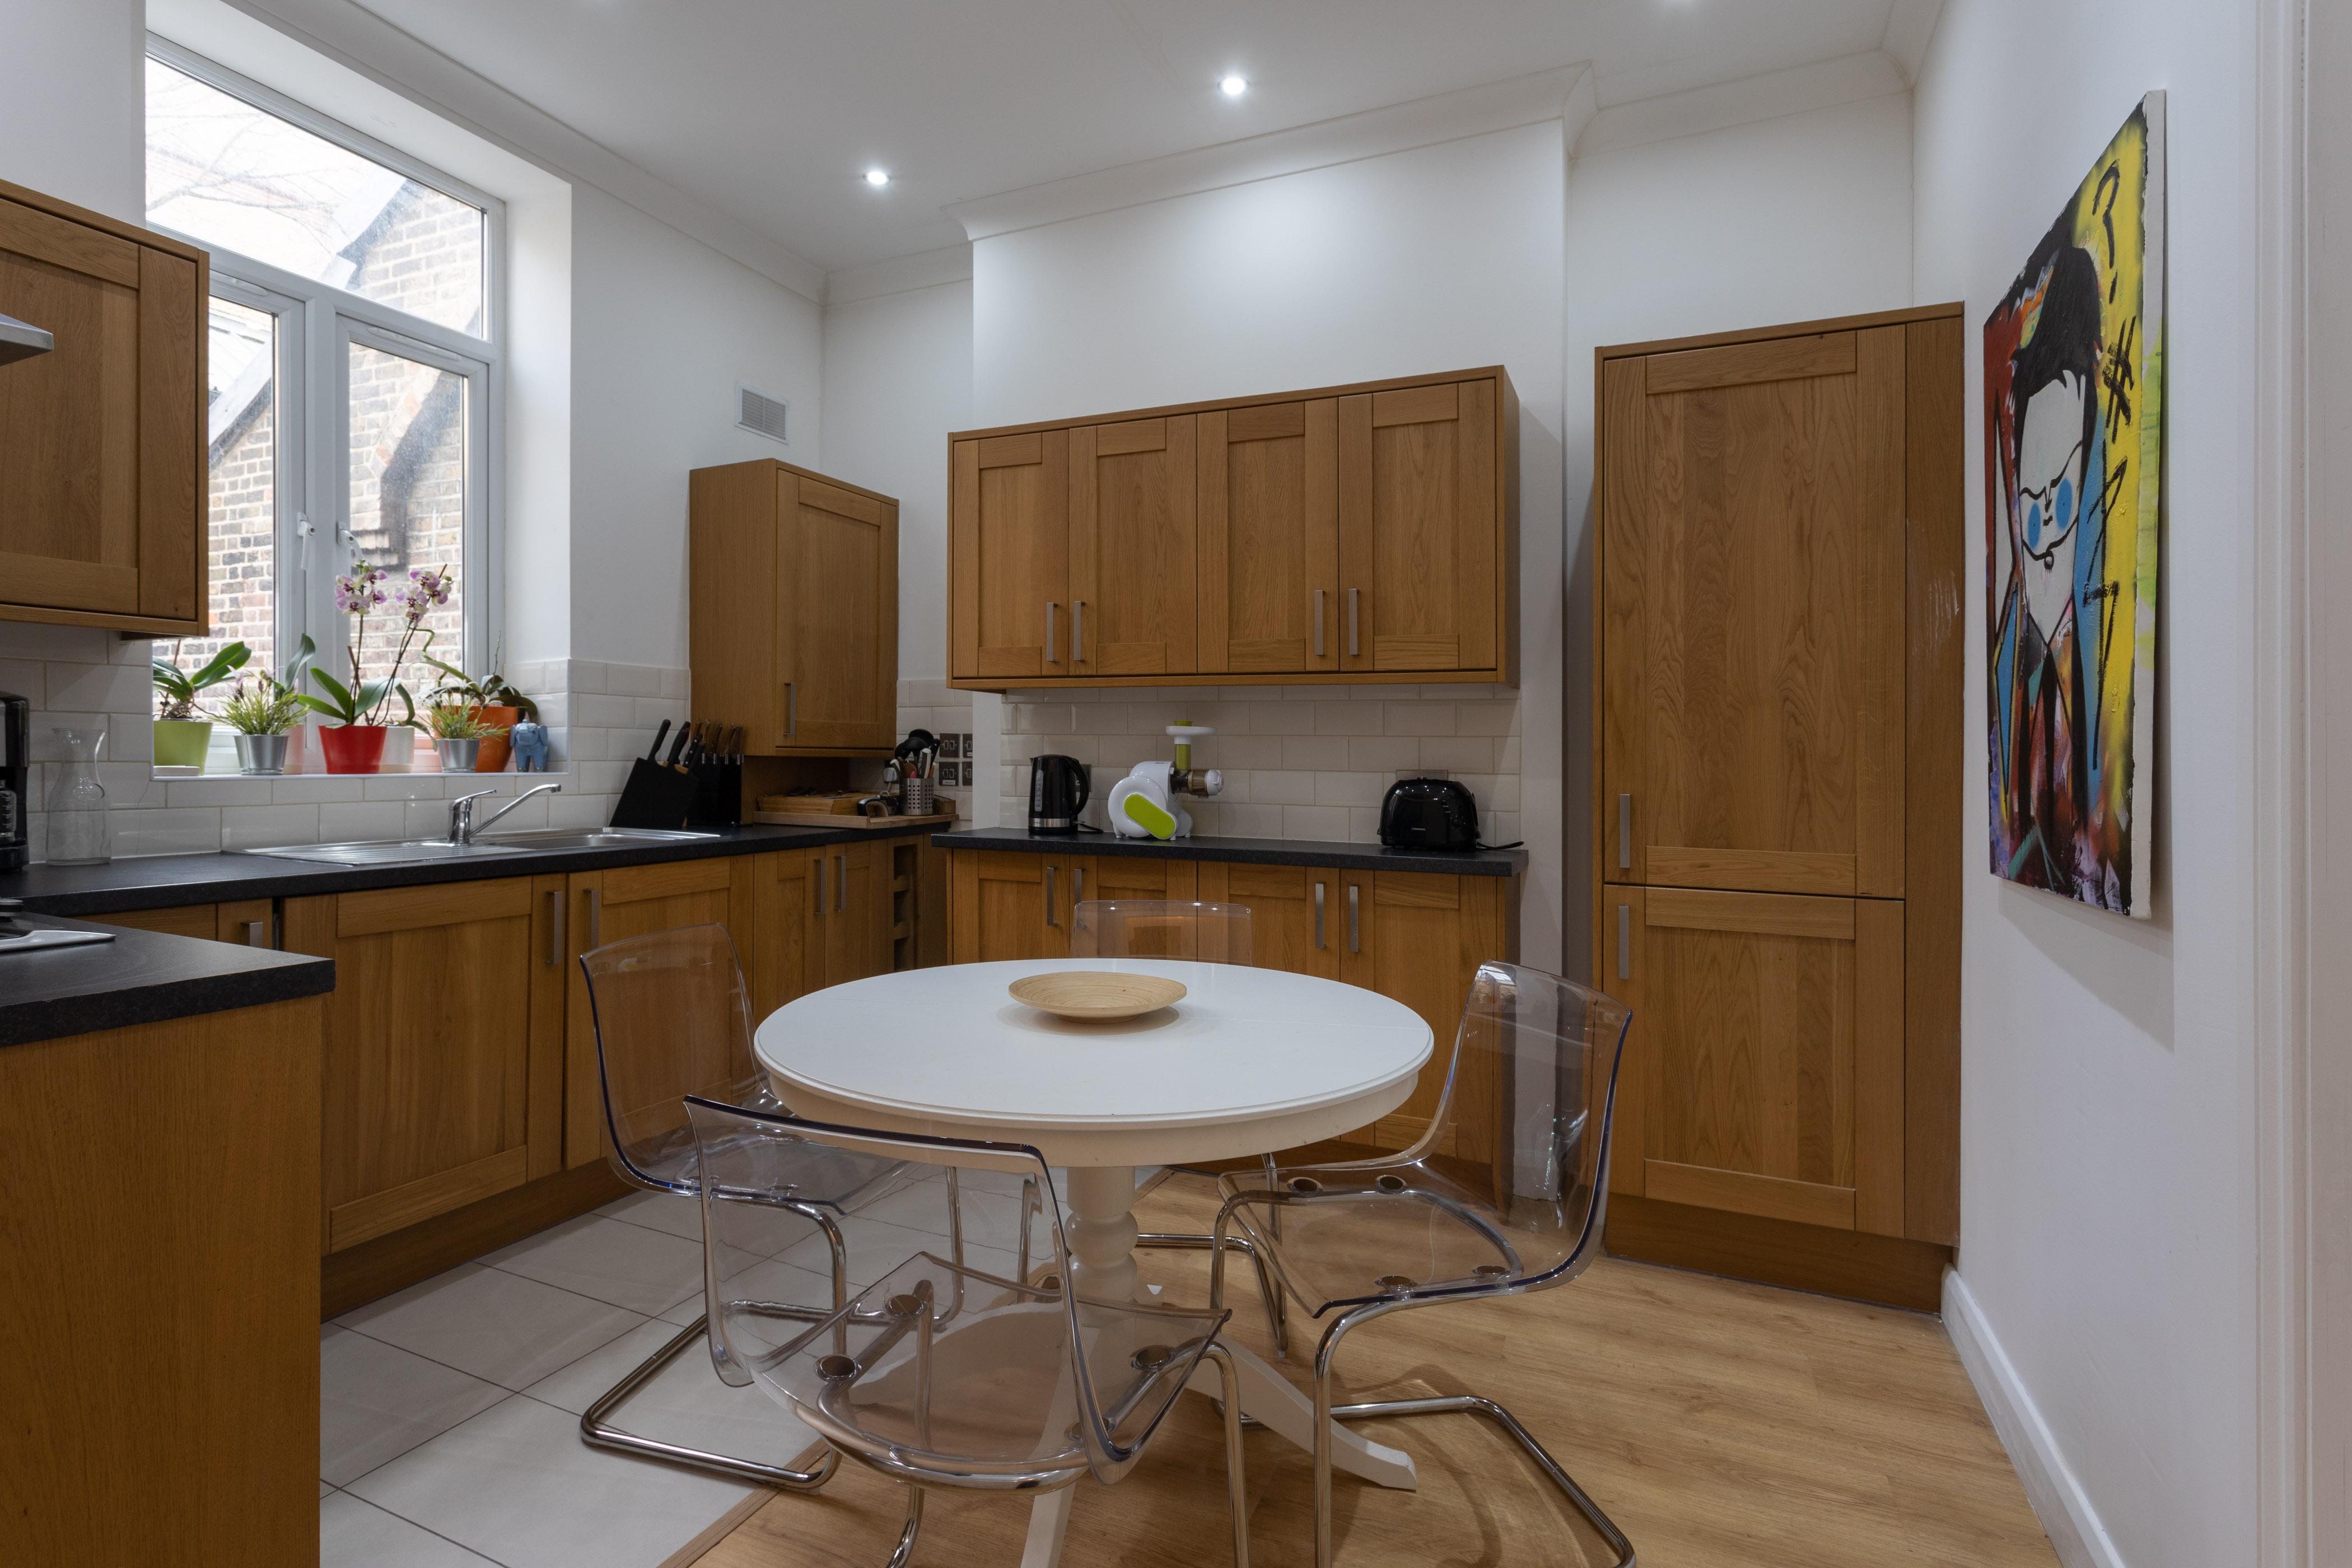 Apartment King s Cross Eurostar Double Room - Shared Bathroom - Shared Kitchen  ROOM 4  photo 26059384